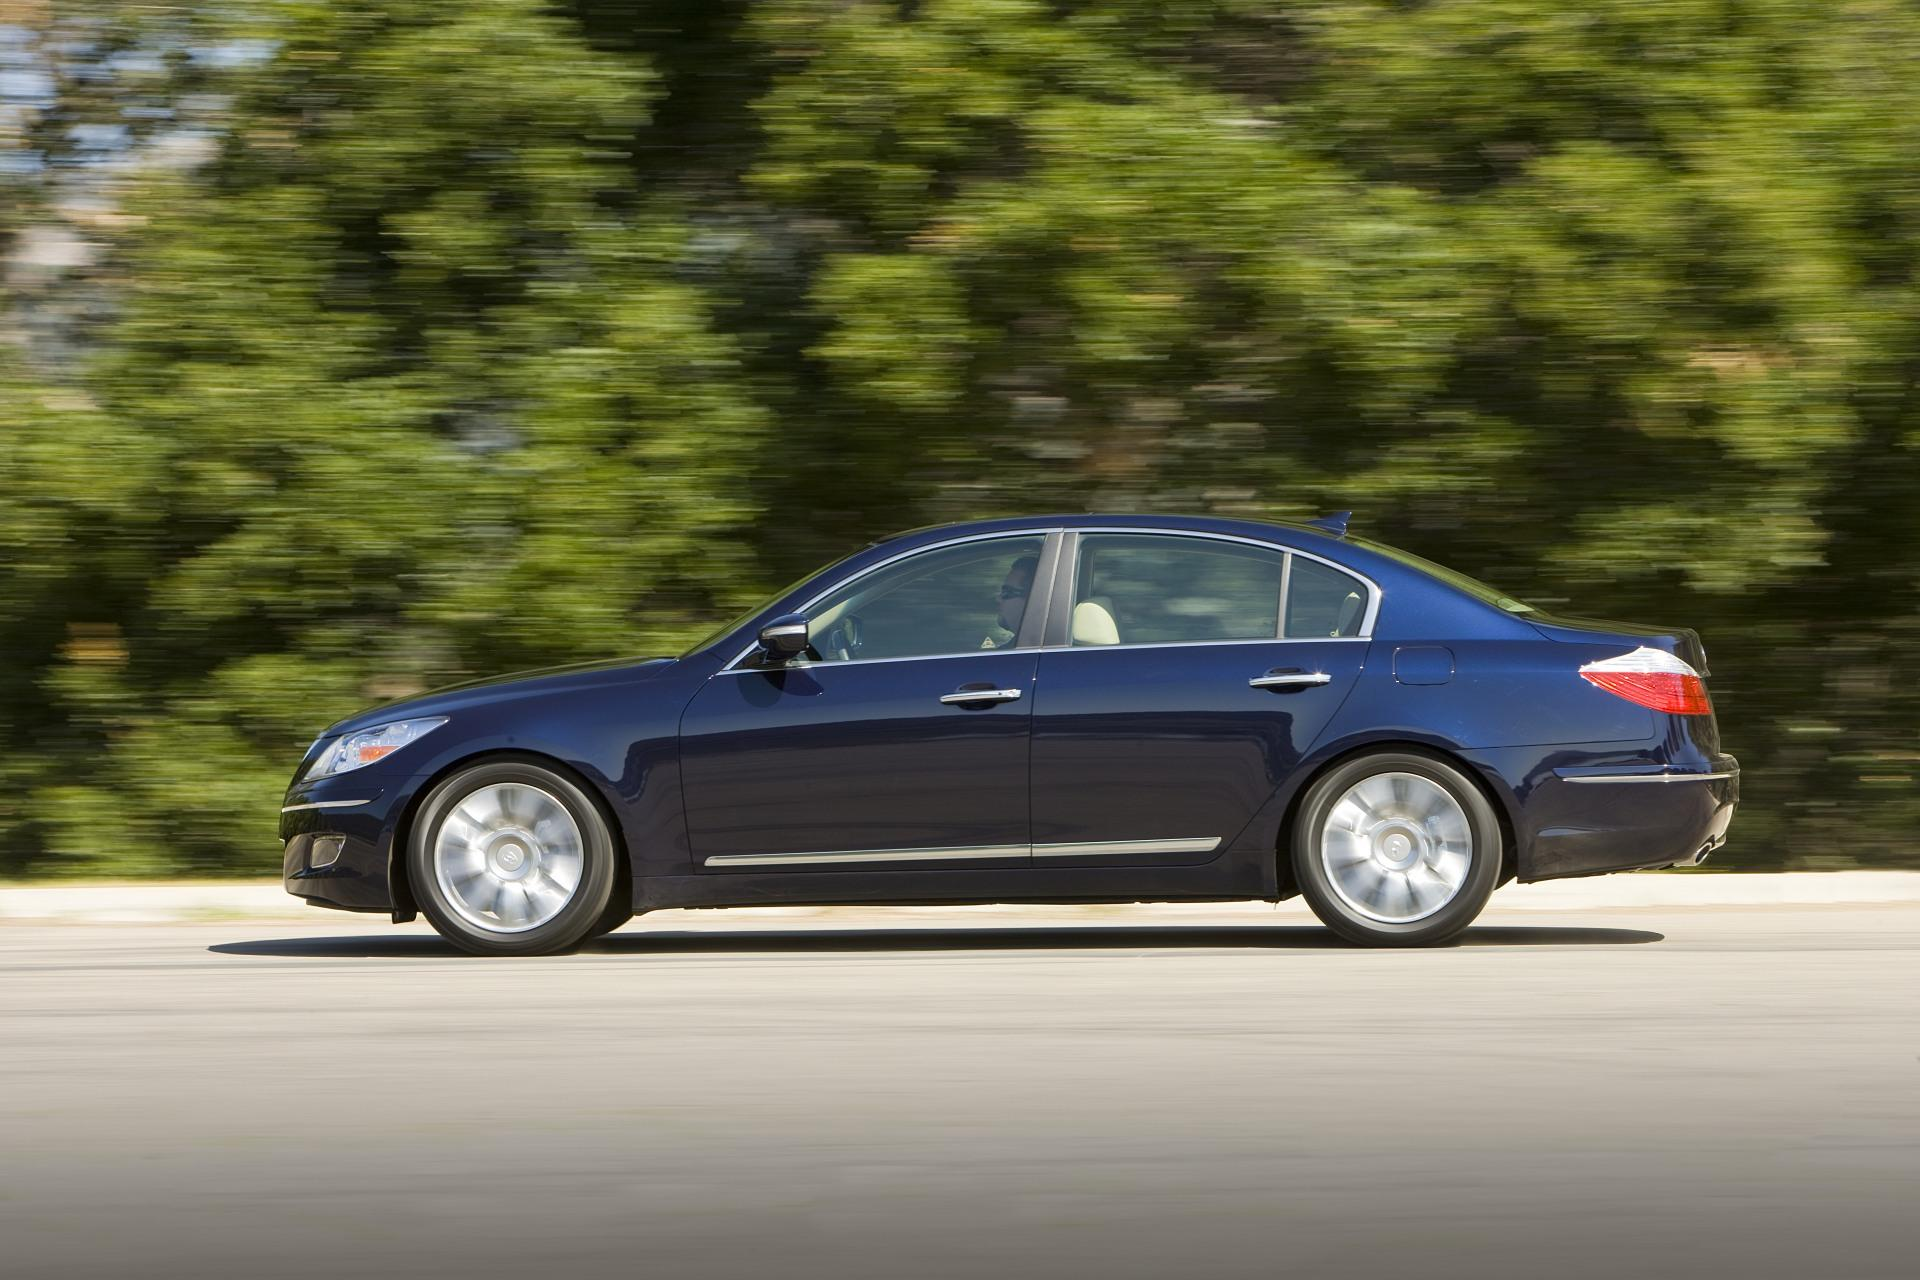 Genesis Auto Sales >> 2011 Hyundai Genesis News and Information | conceptcarz.com